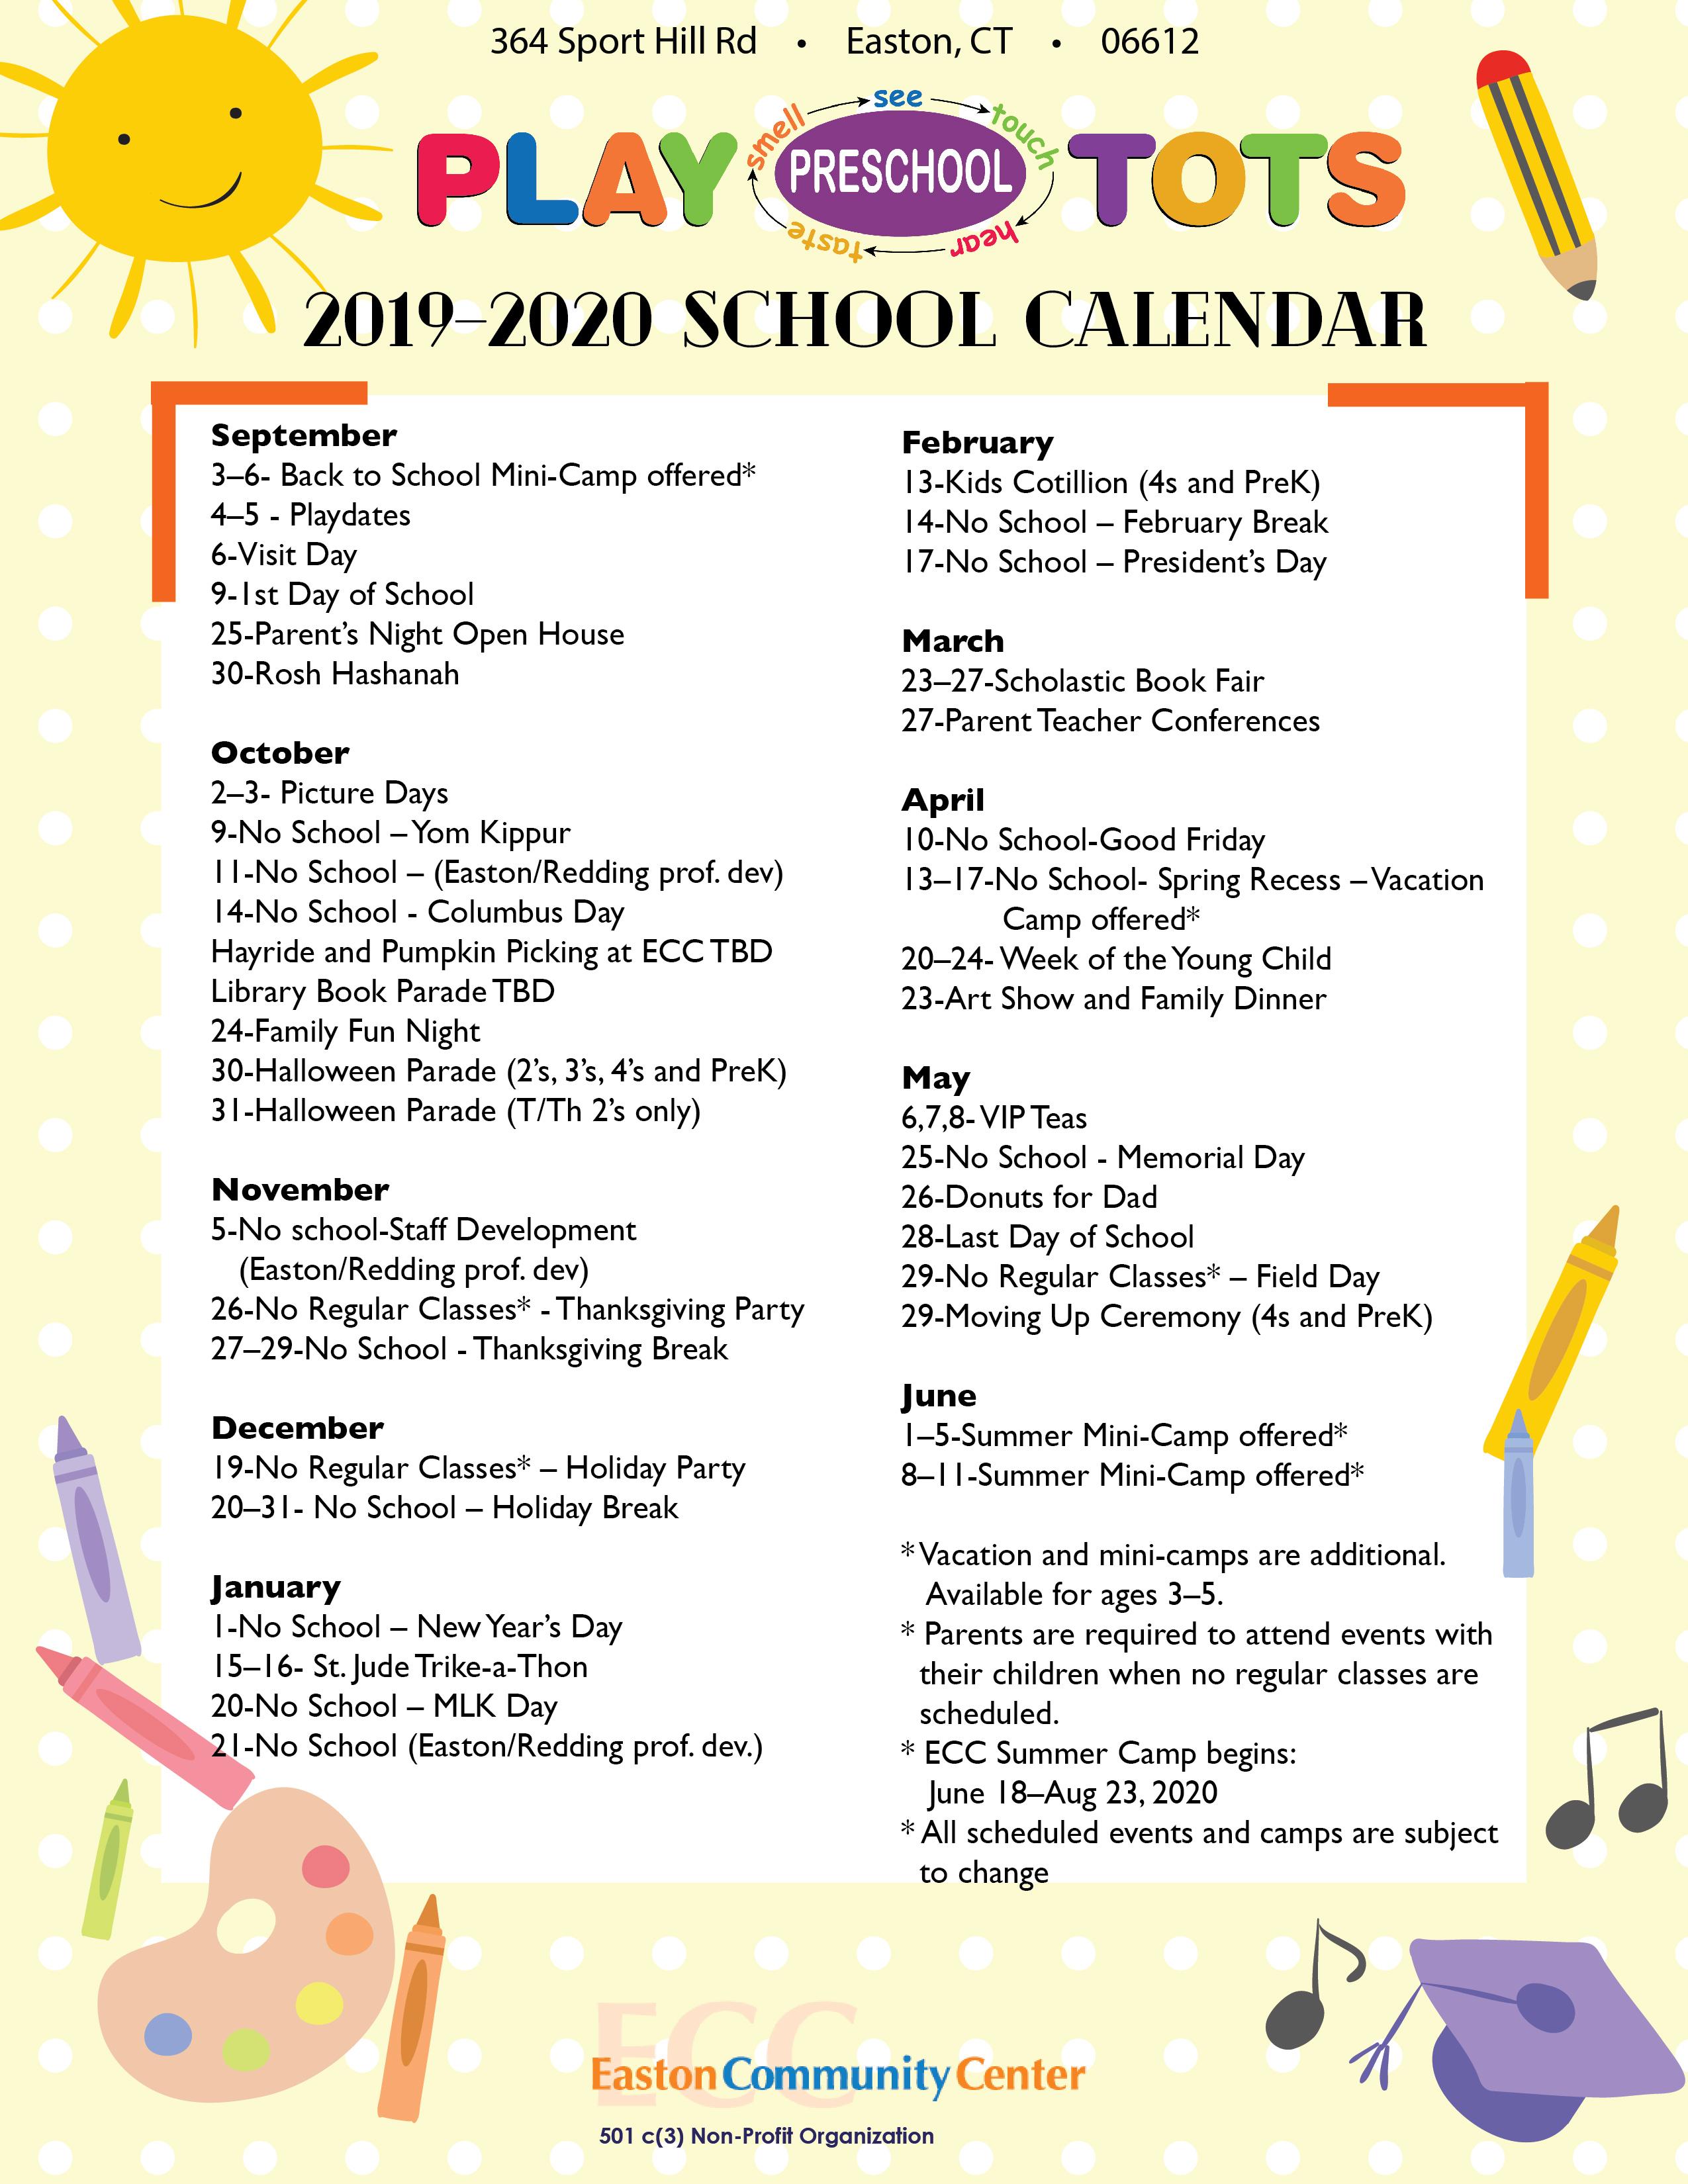 Playtots Calendar 2019  2020 01 | Playtots With Regard To East Meadow High School Calandar 2012